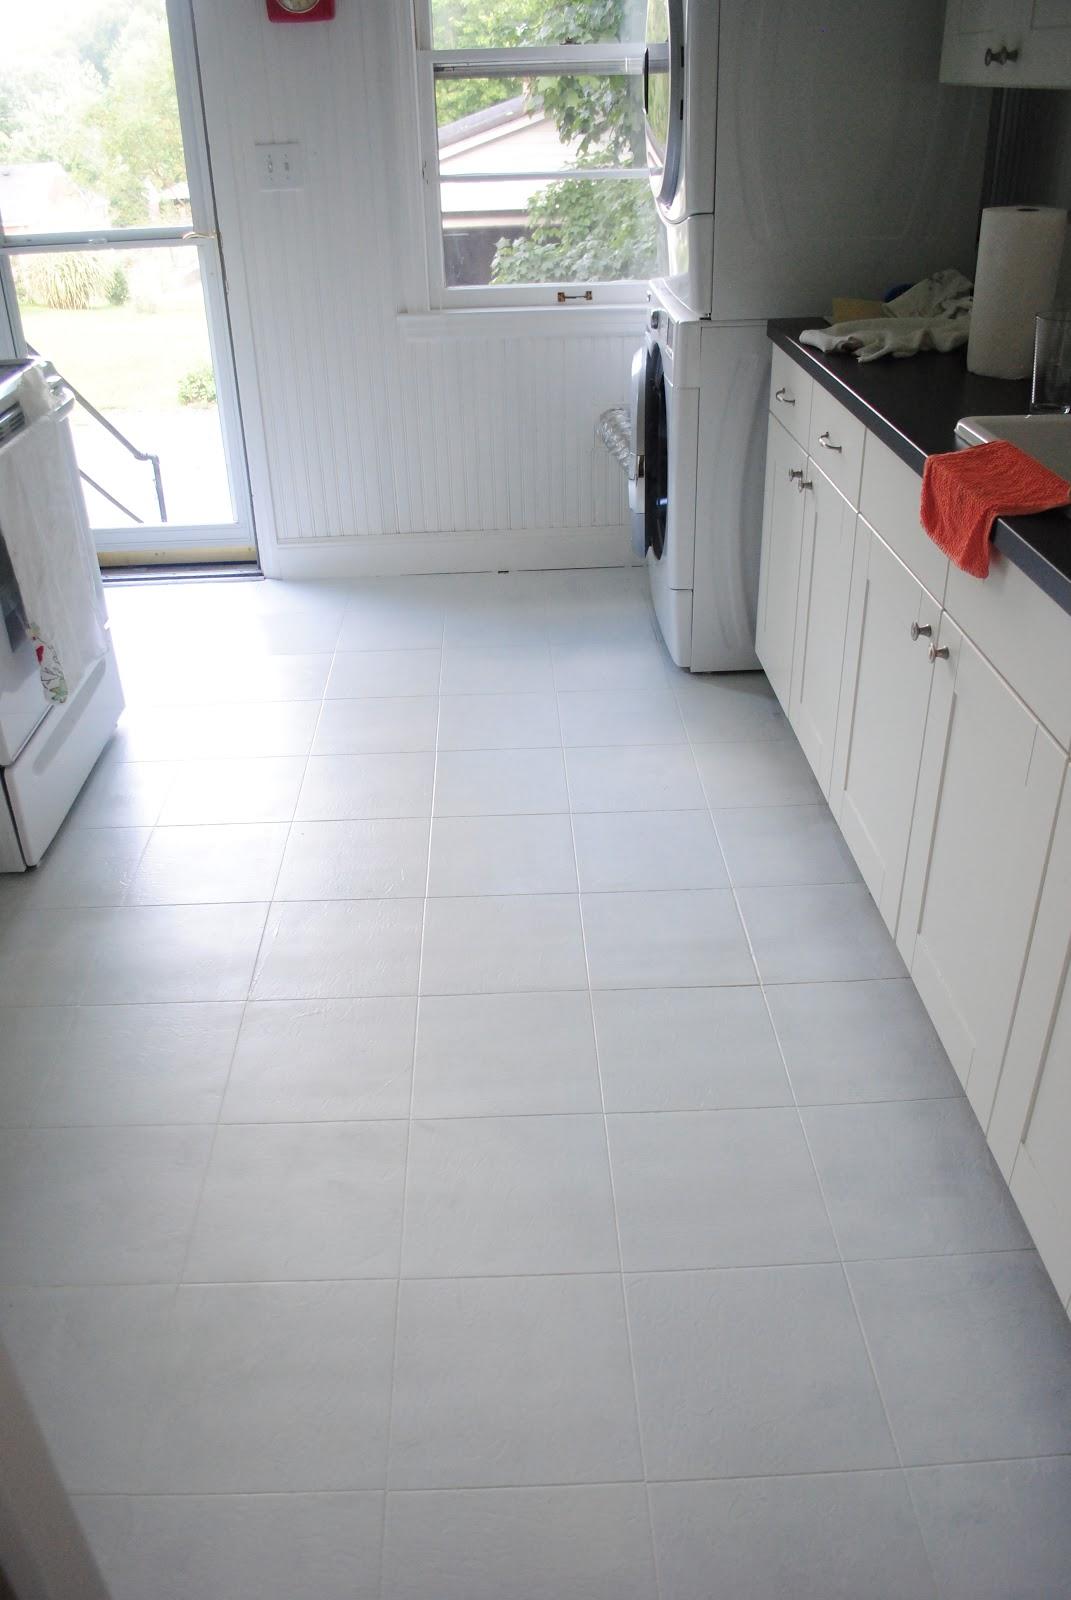 ruffles rhythms painted vinyl floors. Black Bedroom Furniture Sets. Home Design Ideas